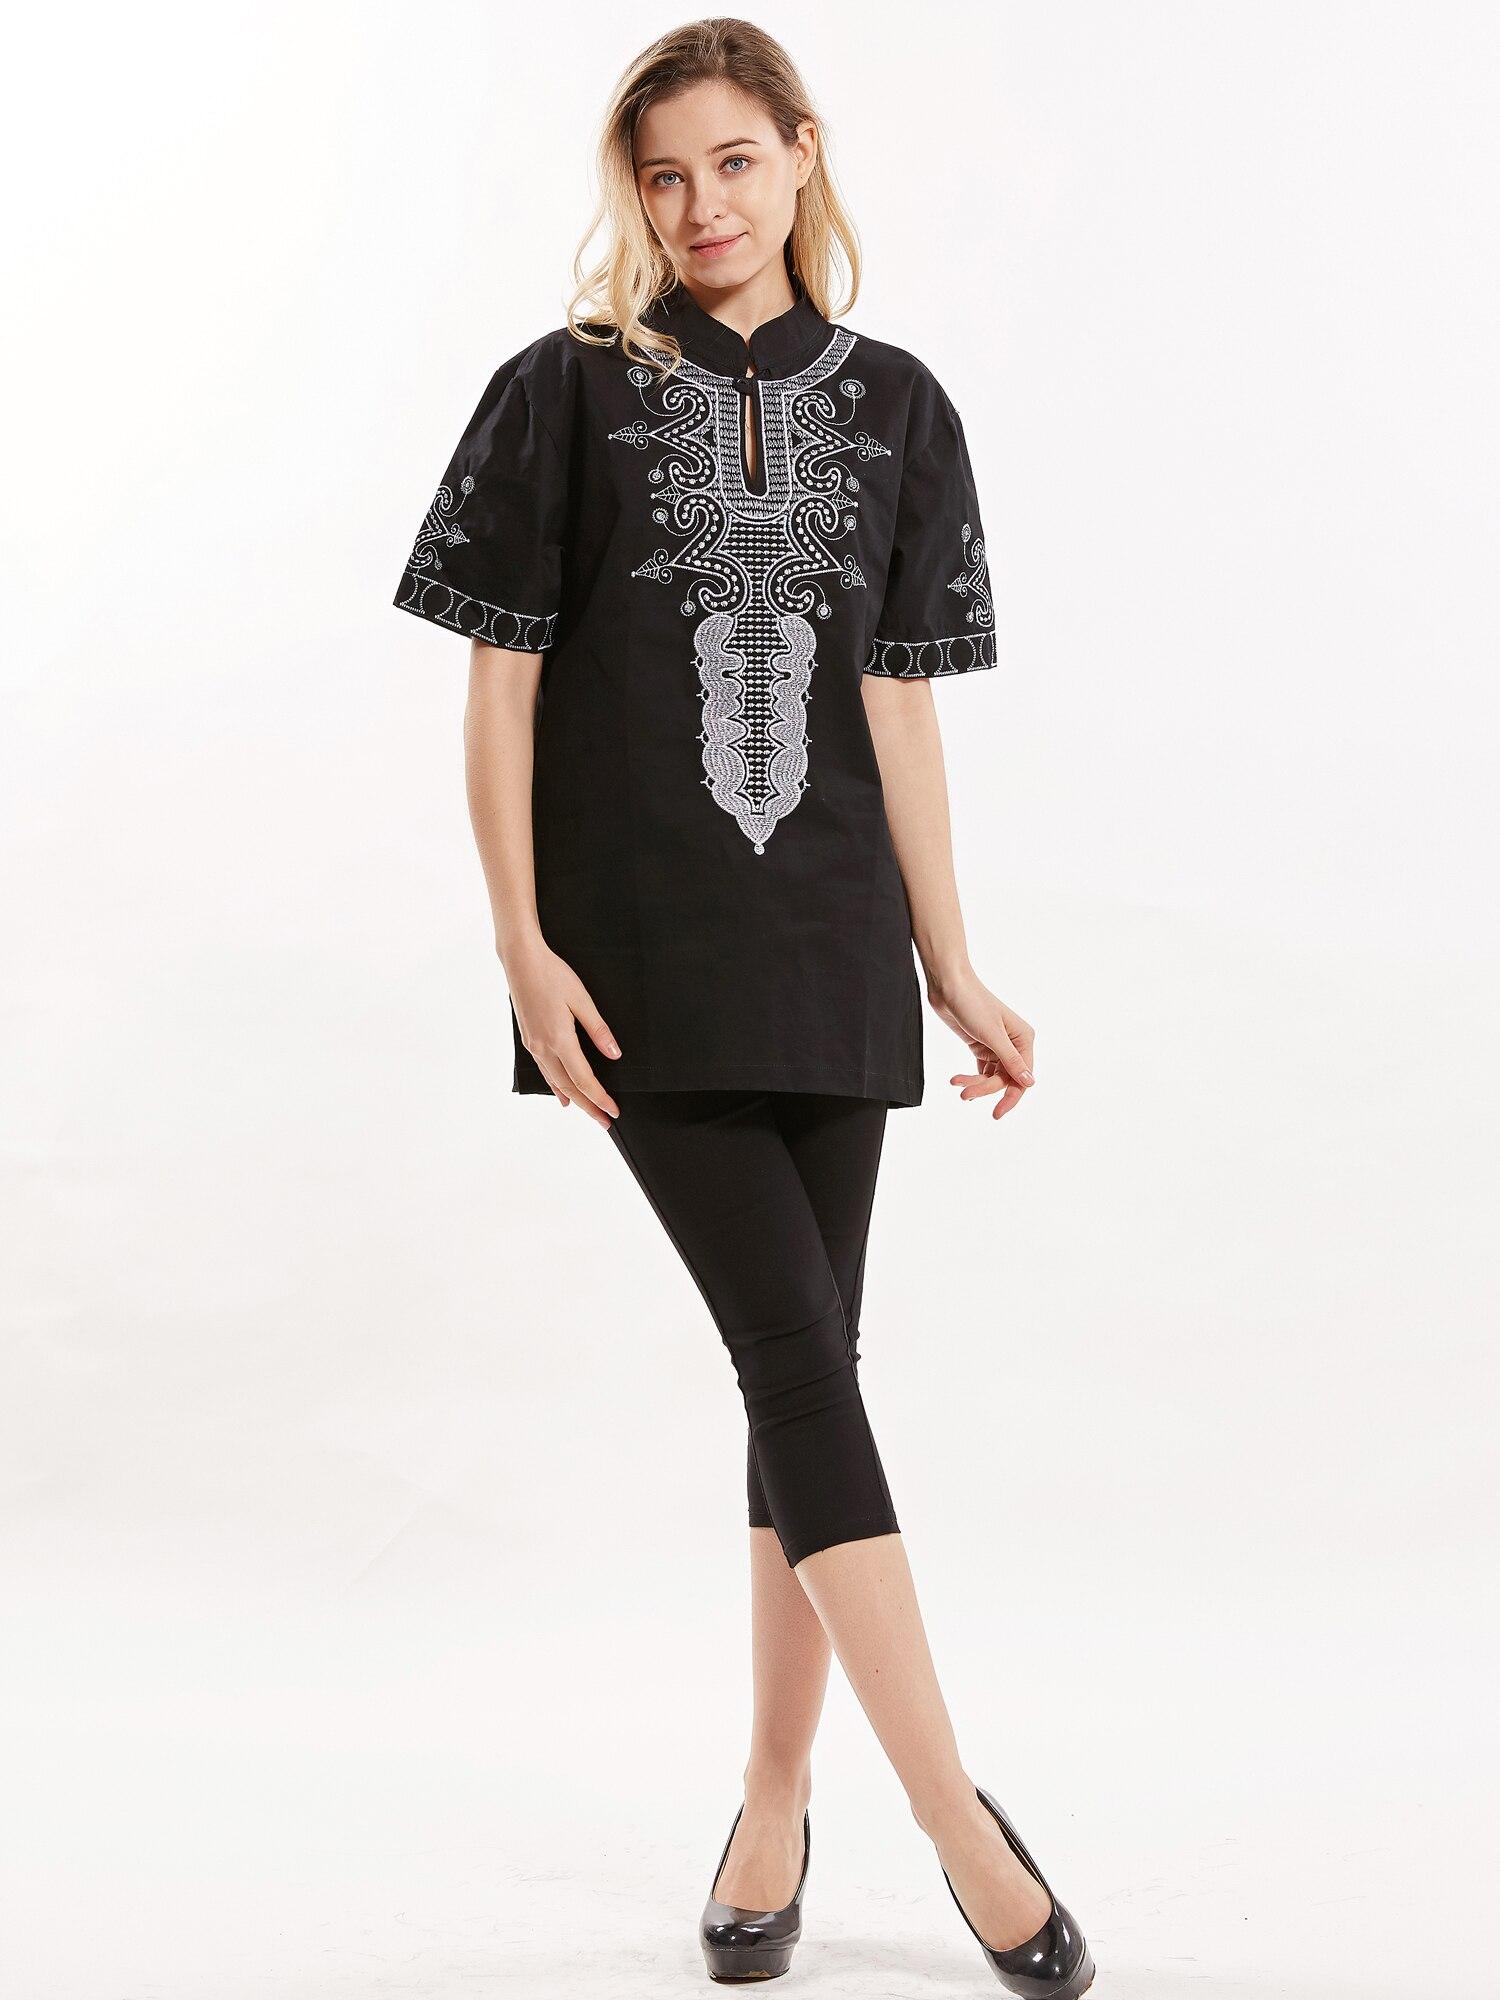 Unisex Dashiki muslim shirt Embroidered Tailored islamic clothing jelaba homme 2019 muslim wear